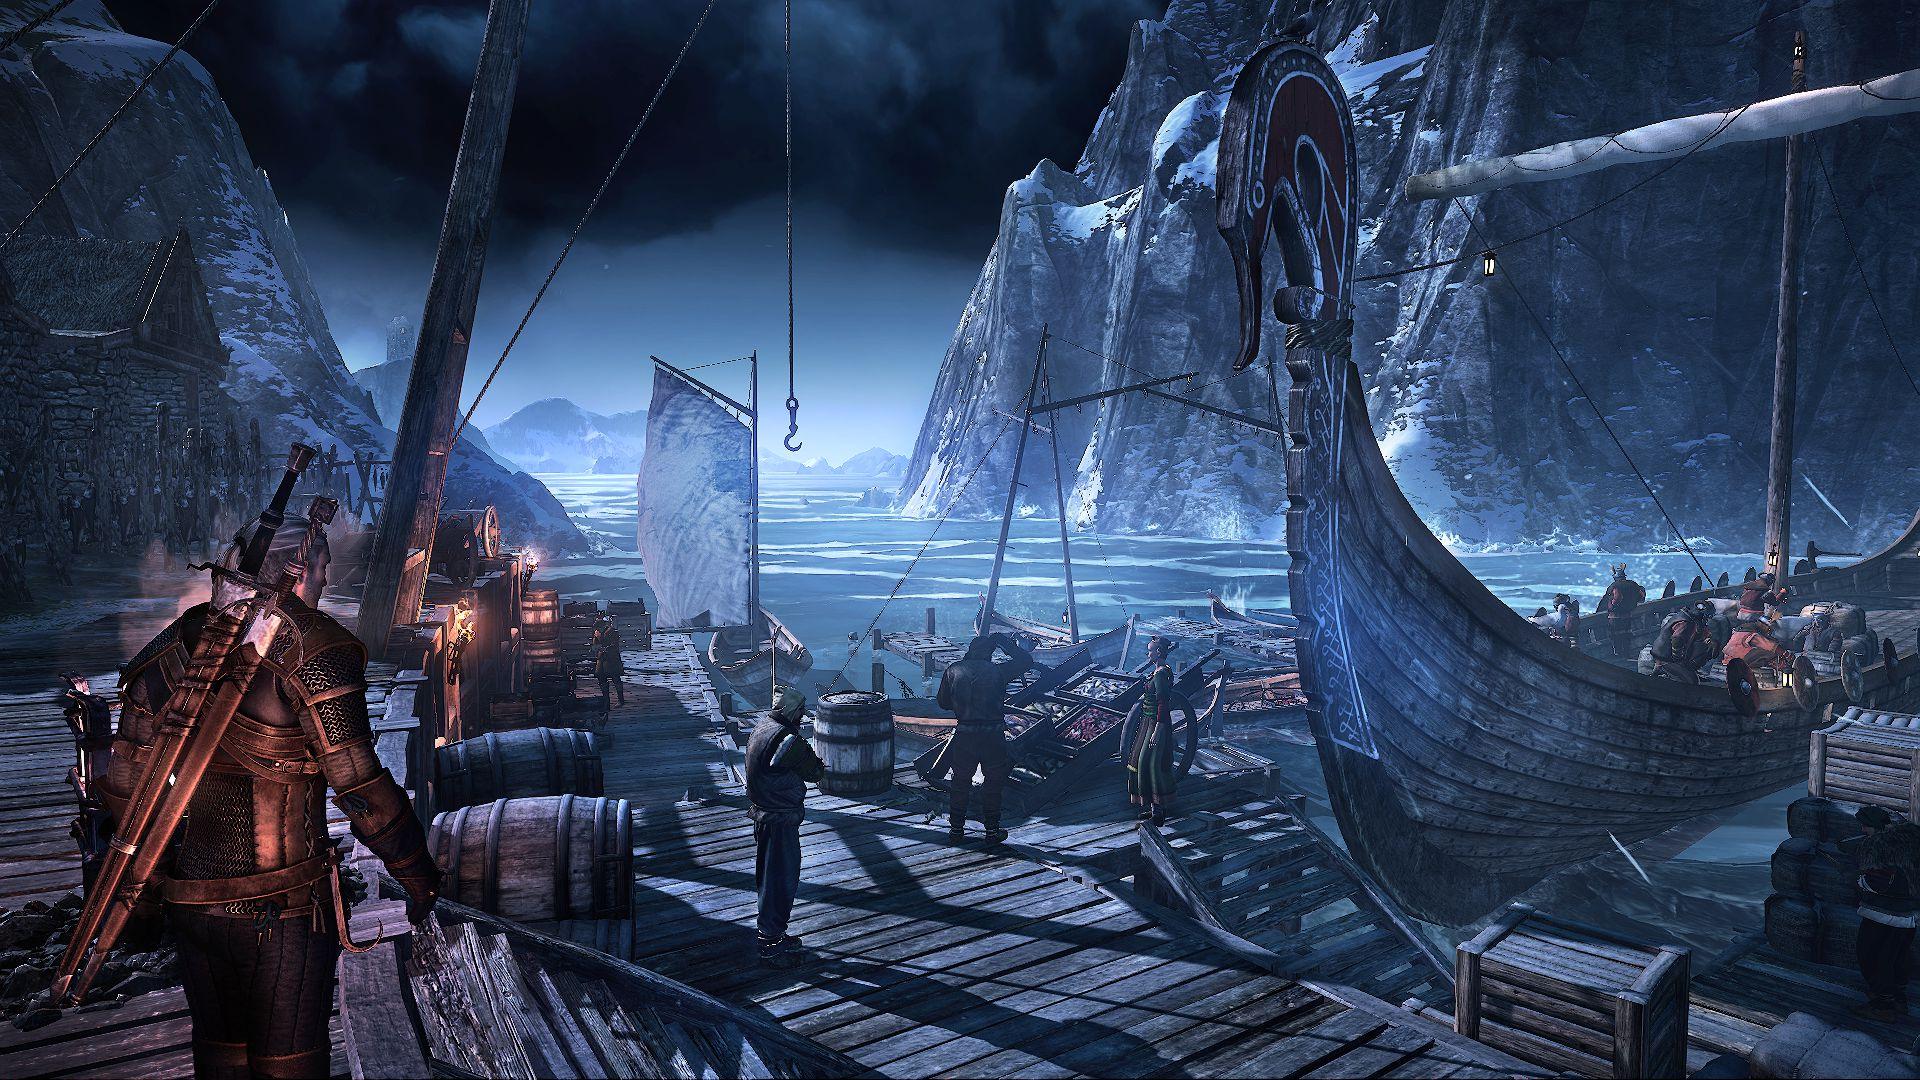 6248_the_witcher_3_wild_hunt_docks_by_night